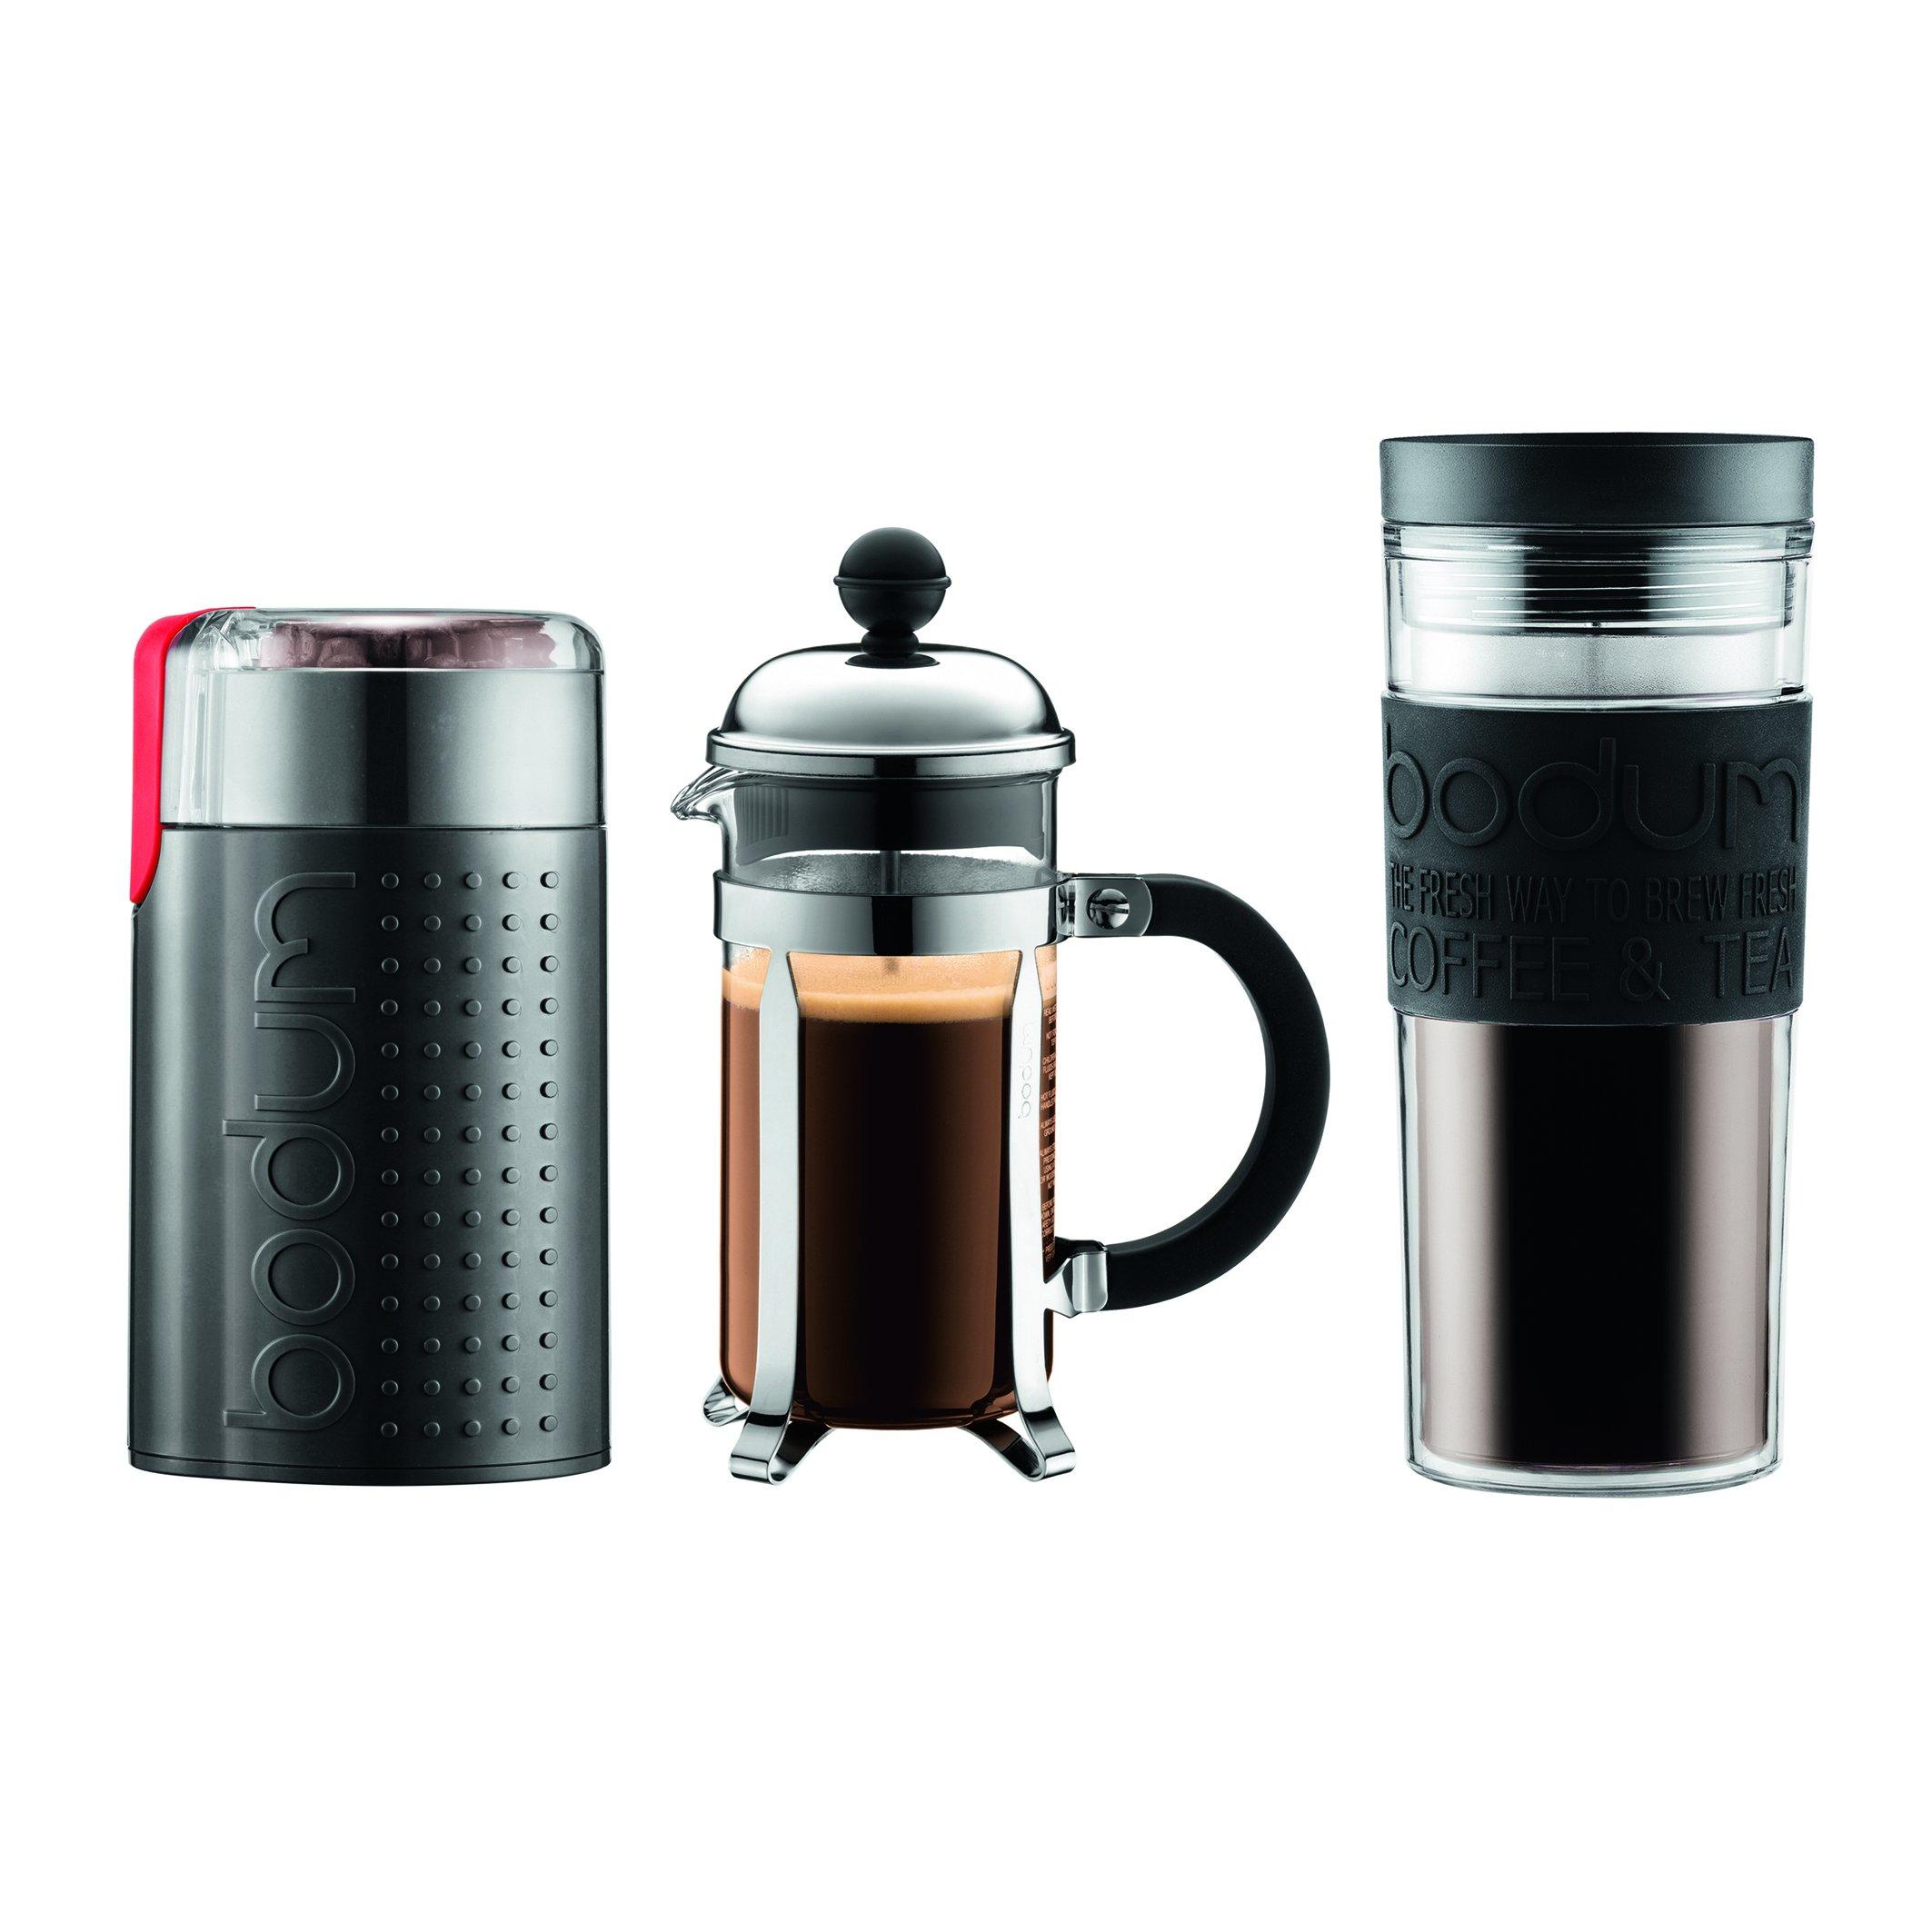 Bodum Chambord Set, French Press 3 Cup Coffee Maker, Electric Coffee Blade Grinder, 15 oz. Travel Mug, , Black